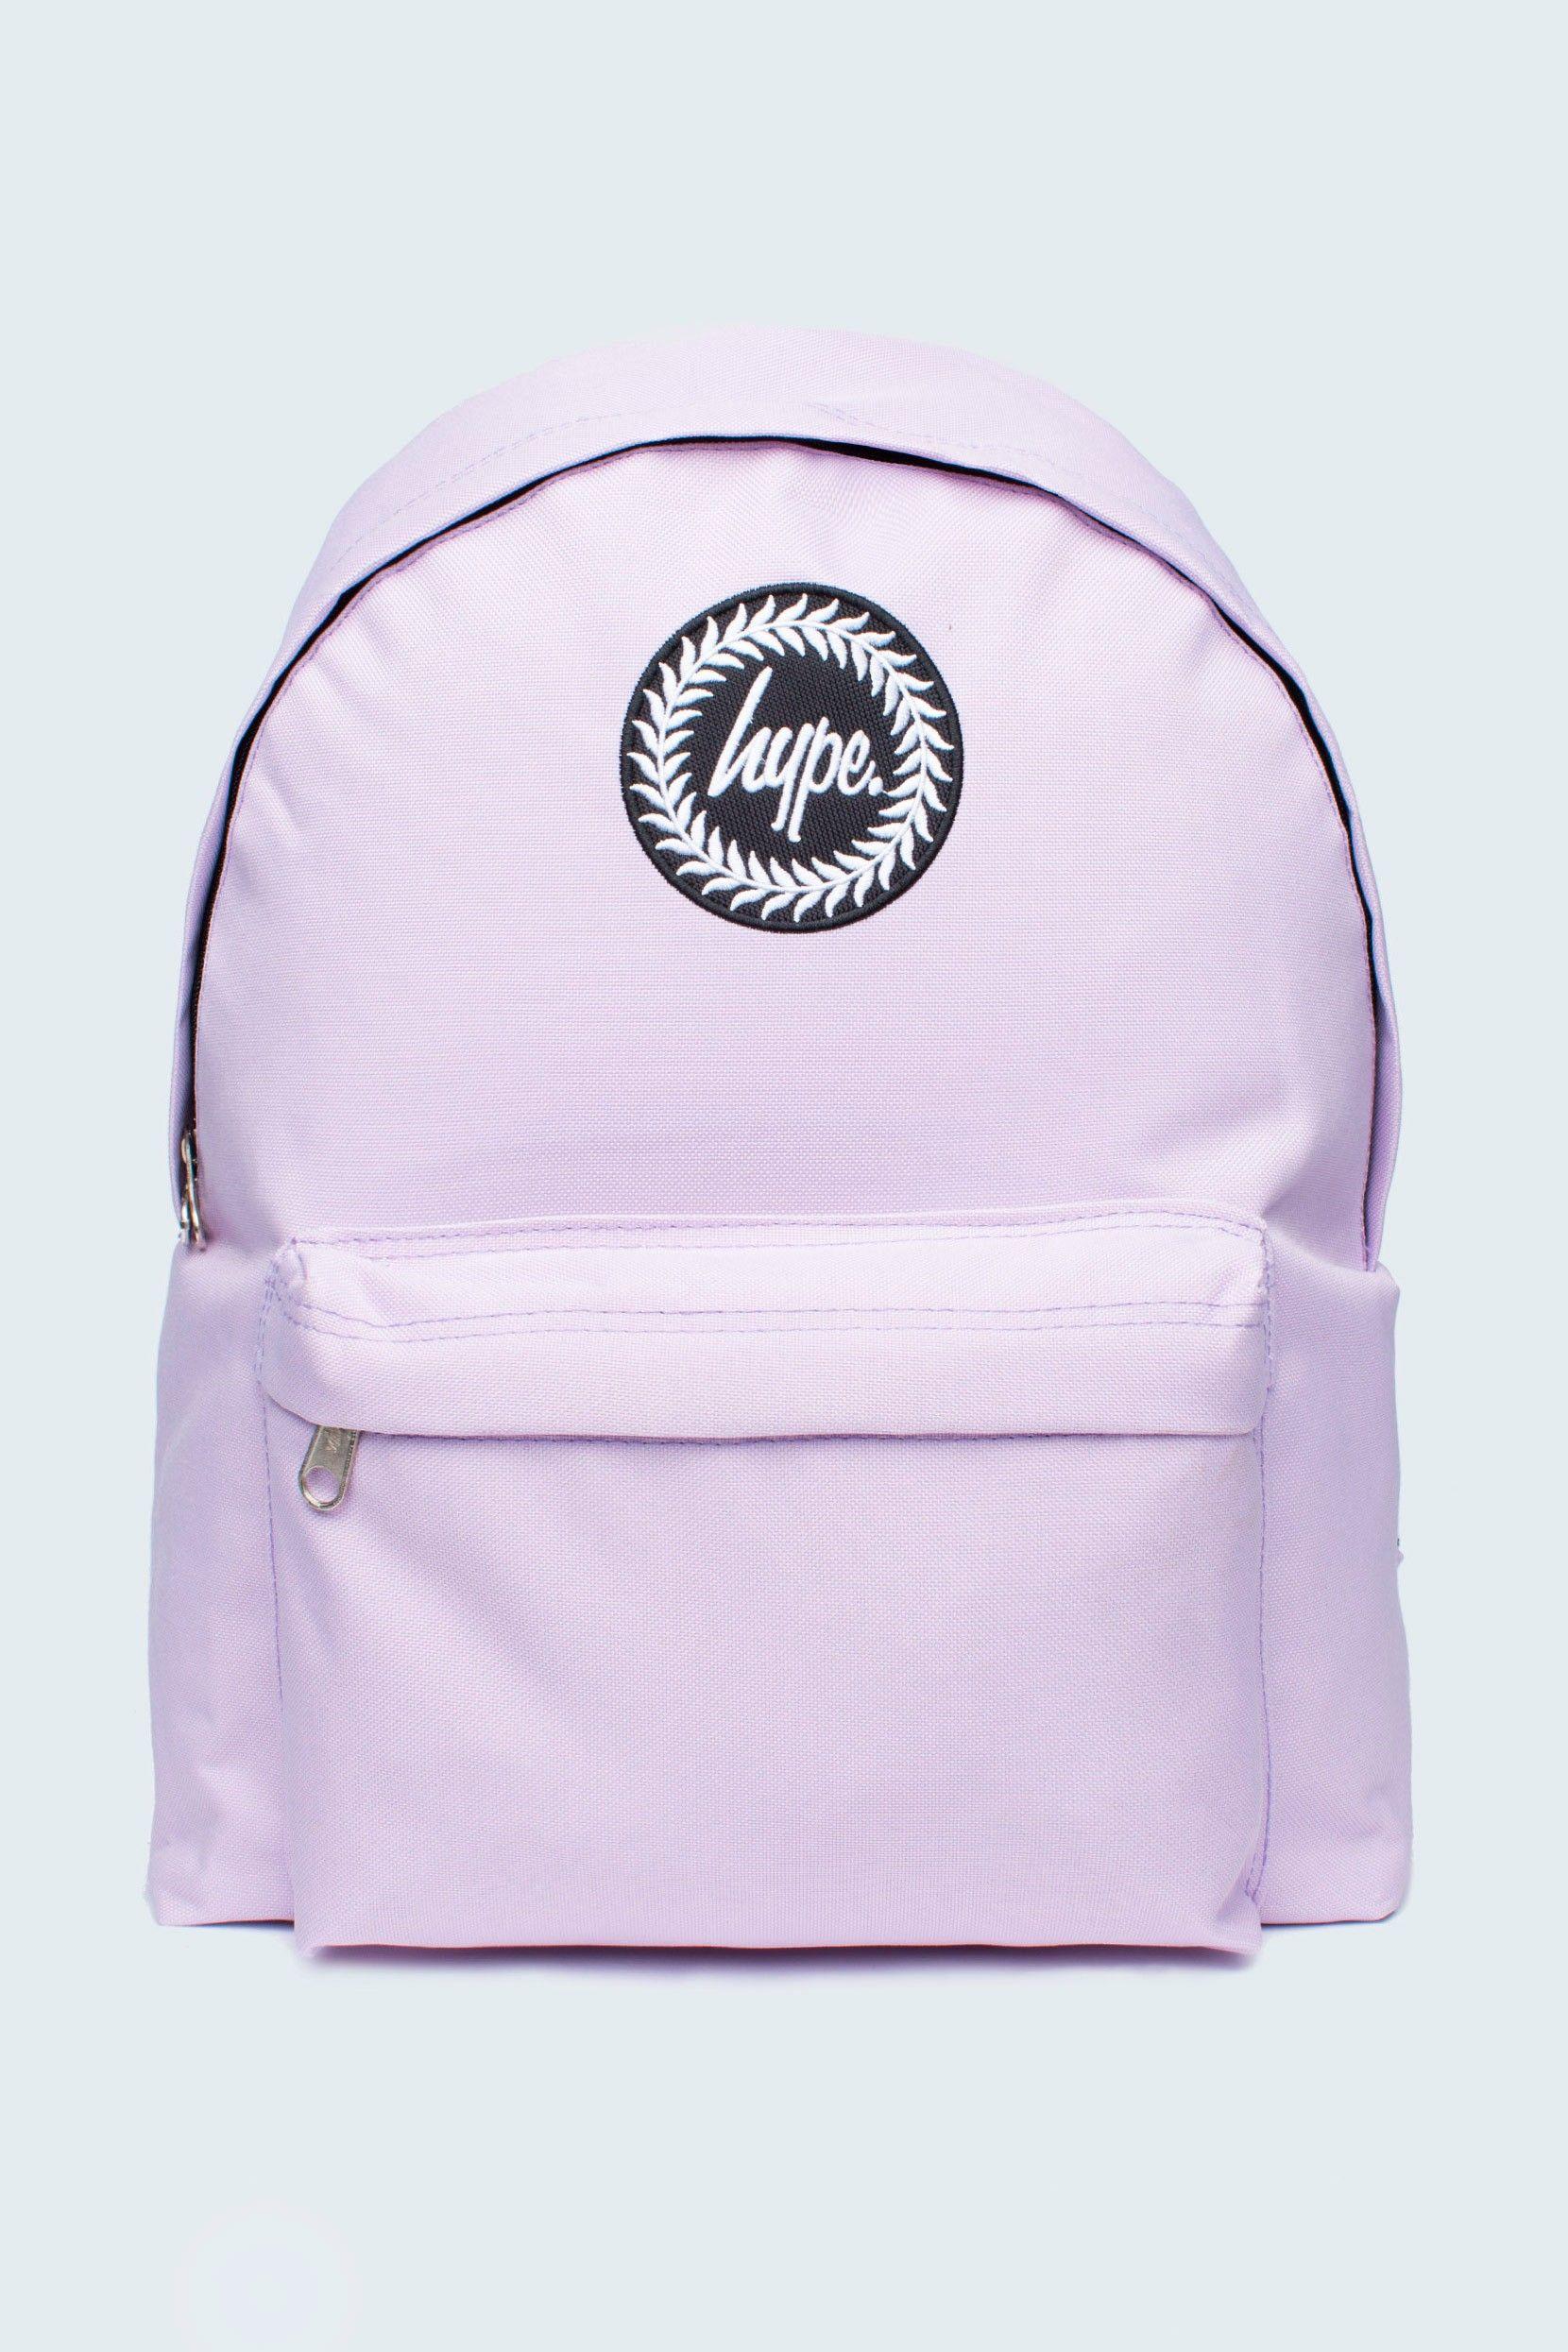 hype pastel purple backpack hypeschool bags pinterest